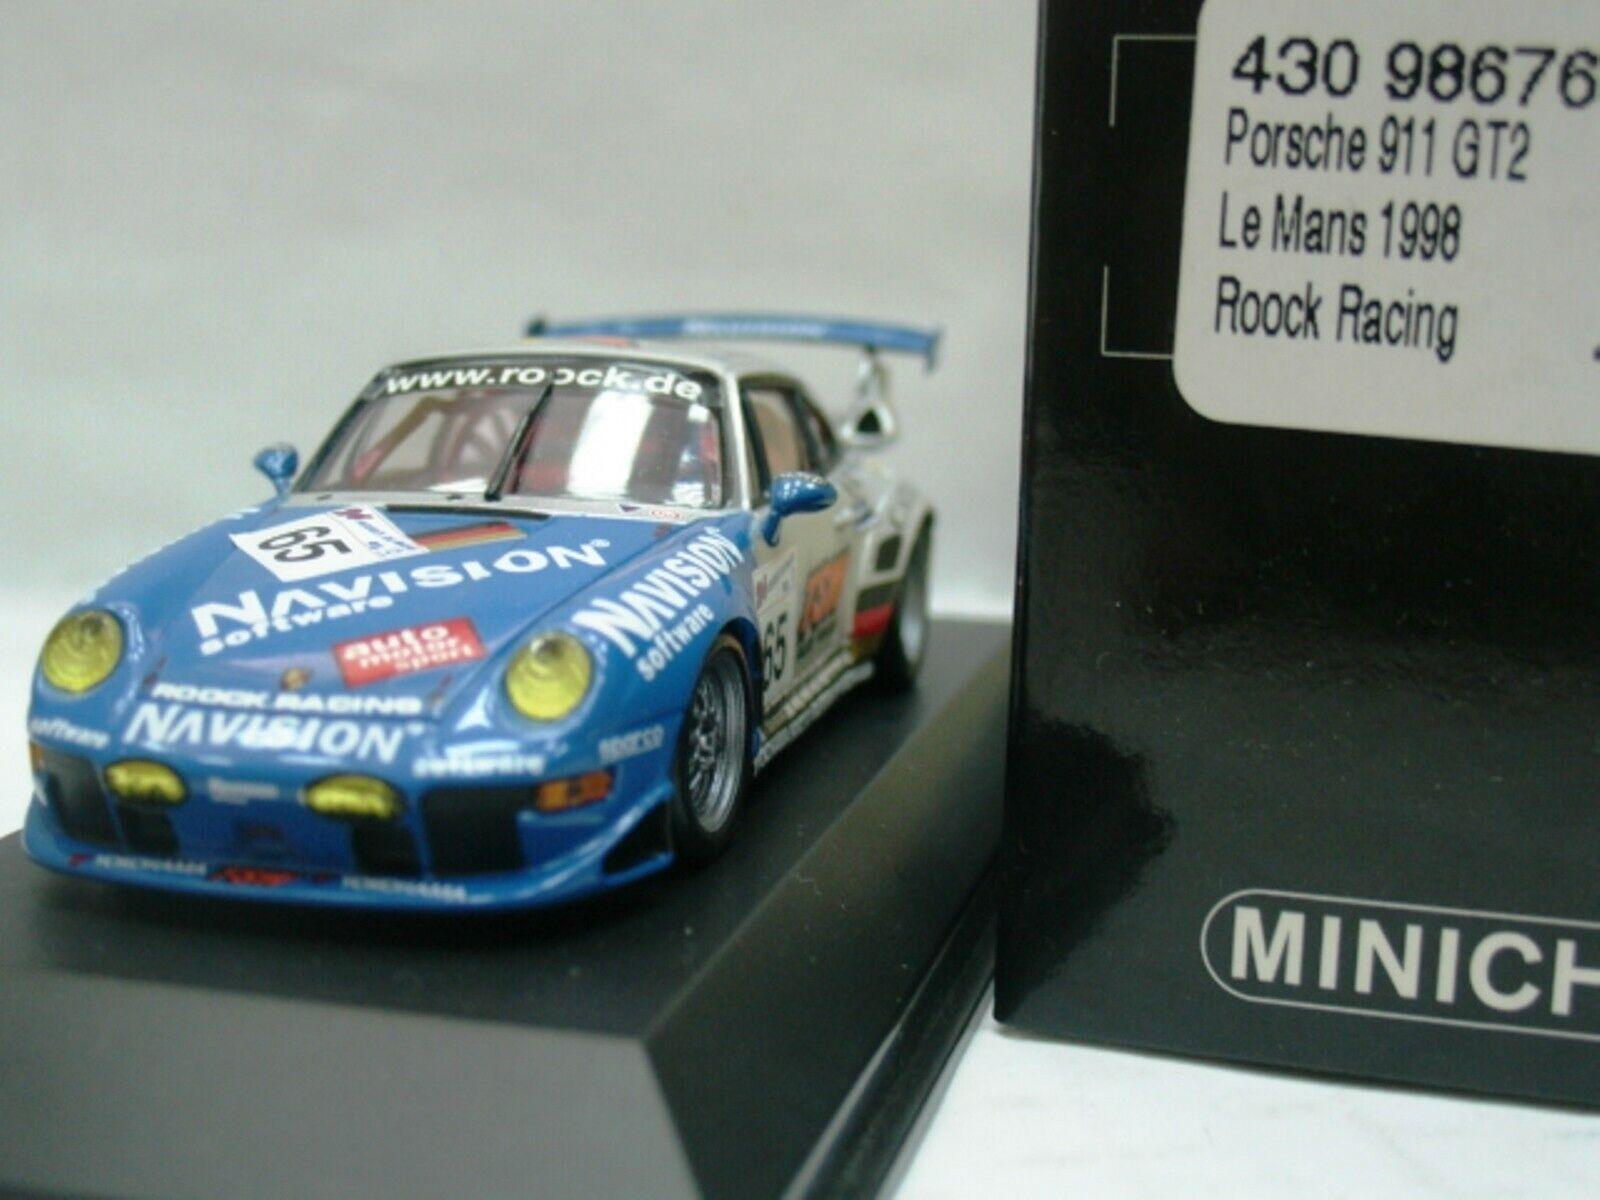 WOW EXTREMELY RARE Porsche 993 911 GT2 Evo2 Evo2 Evo2 LeMans 1998 1 43 Minichamps-RS 3591d6